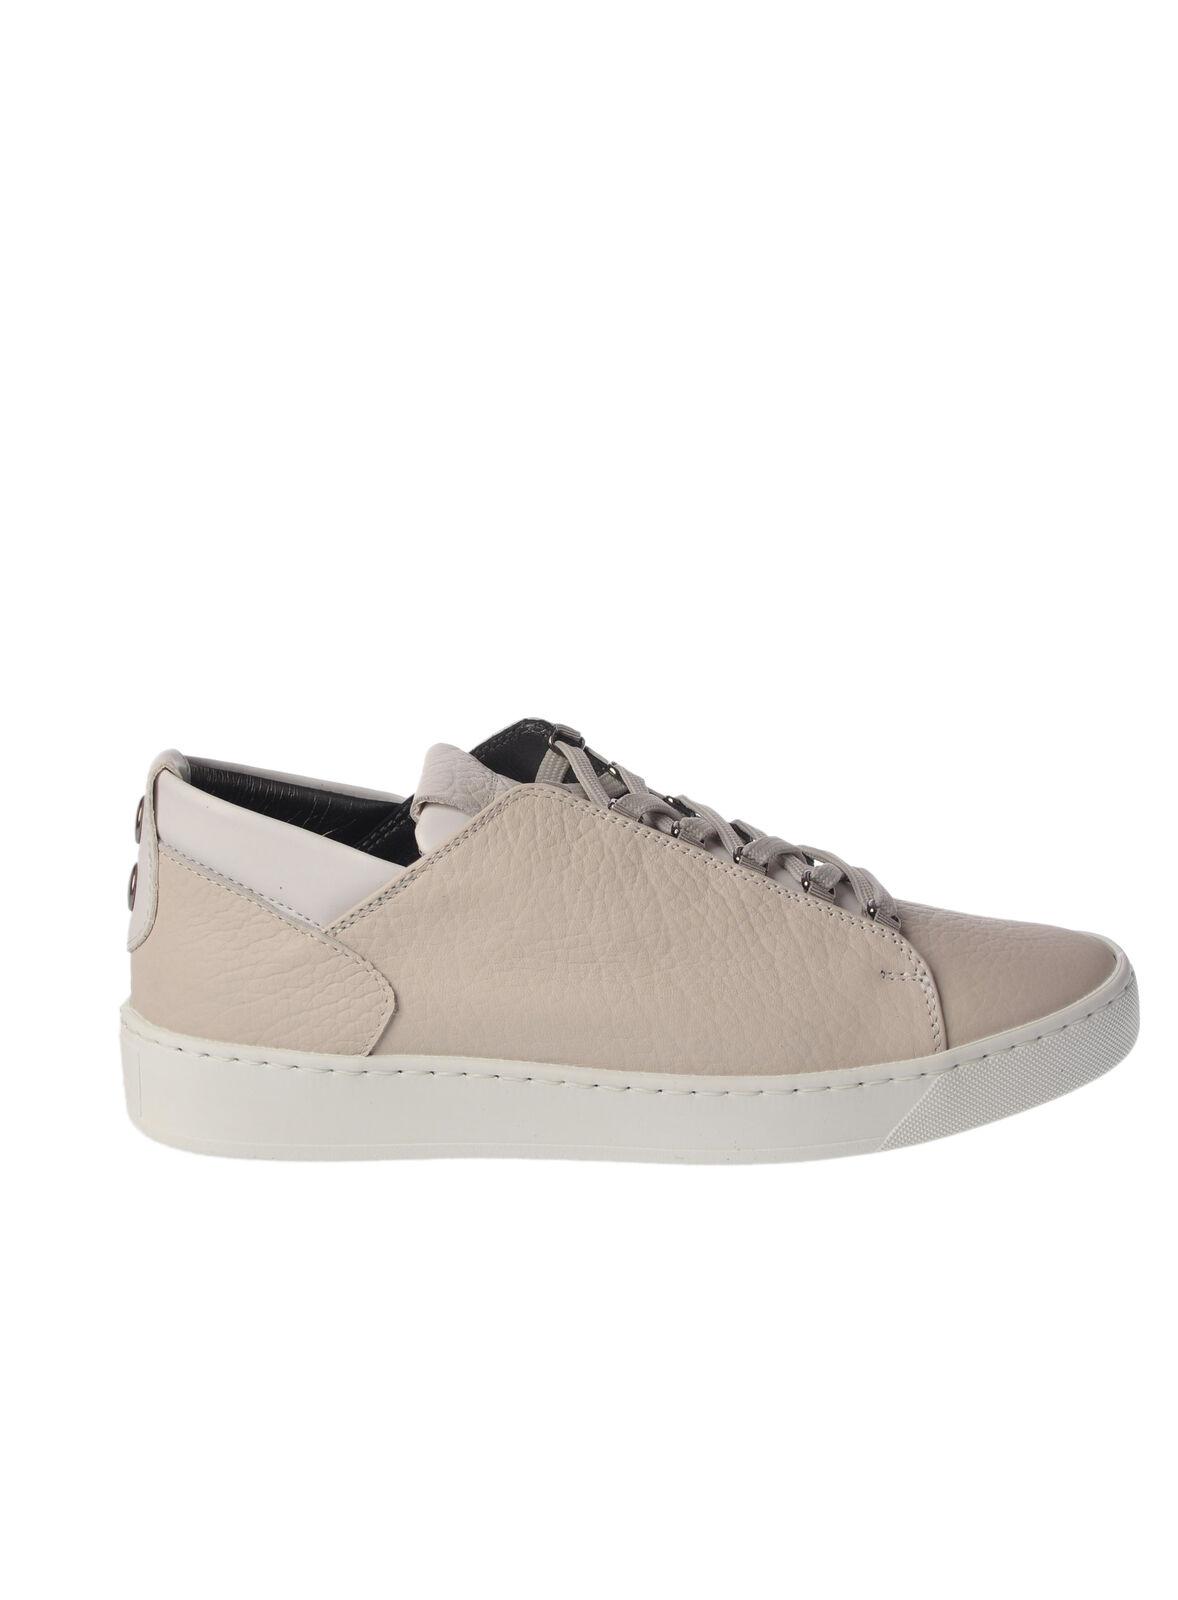 Alexander Smith - shoes-Sneakers low - Man - Beige - 4992813F181133